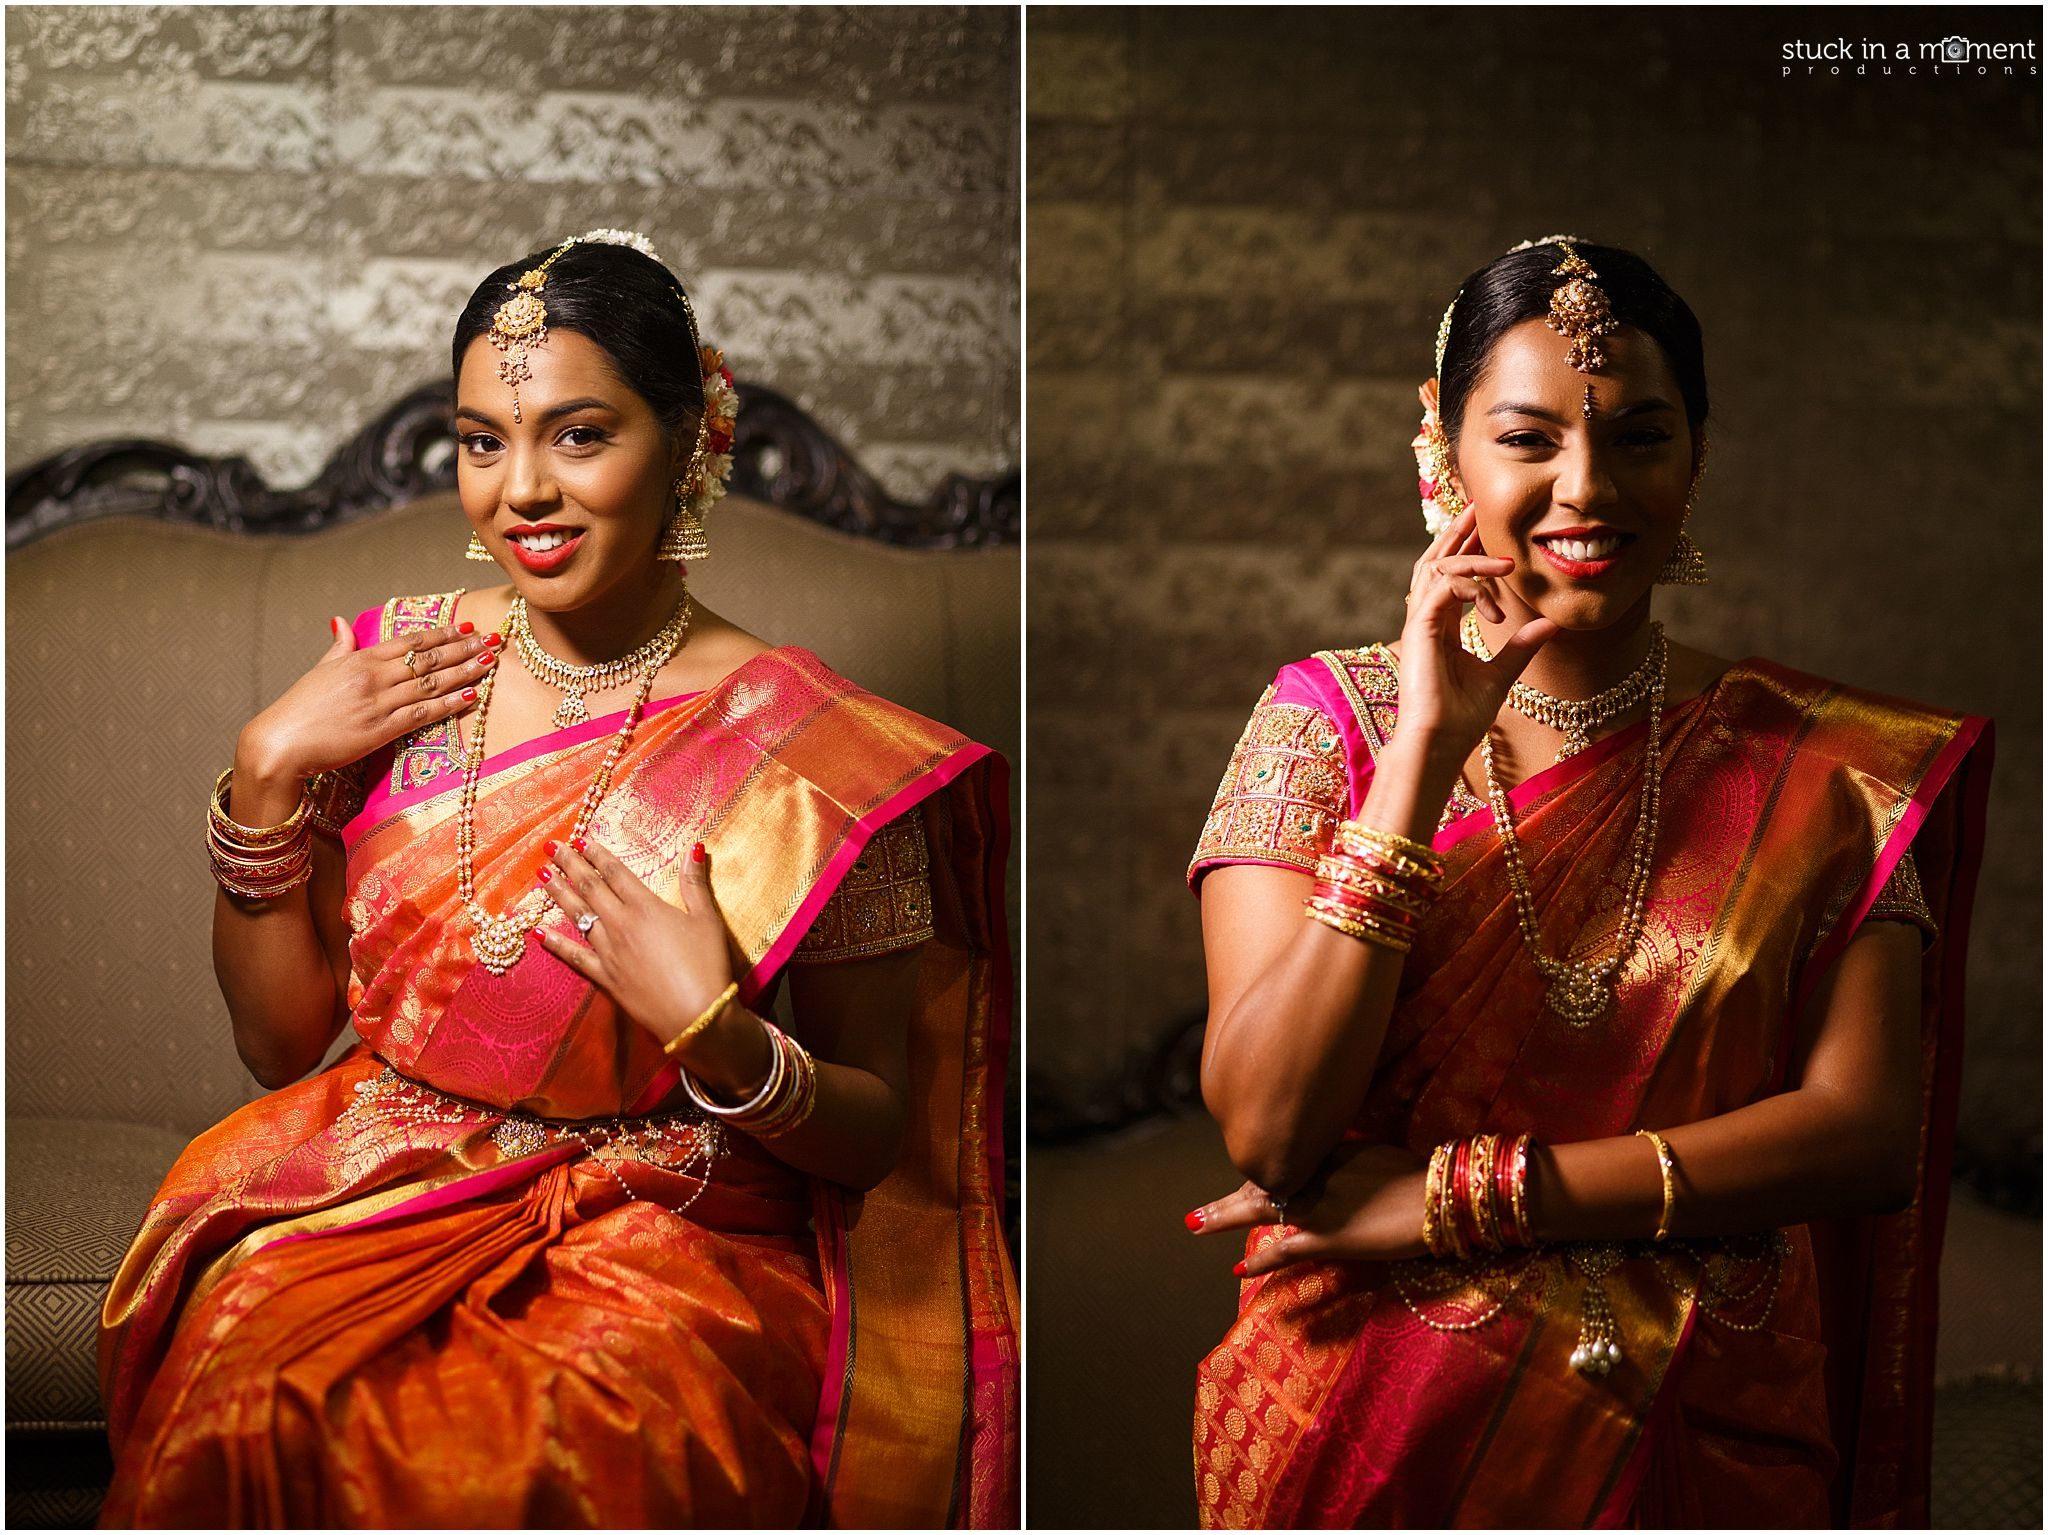 srilankan wedding photographer sydney